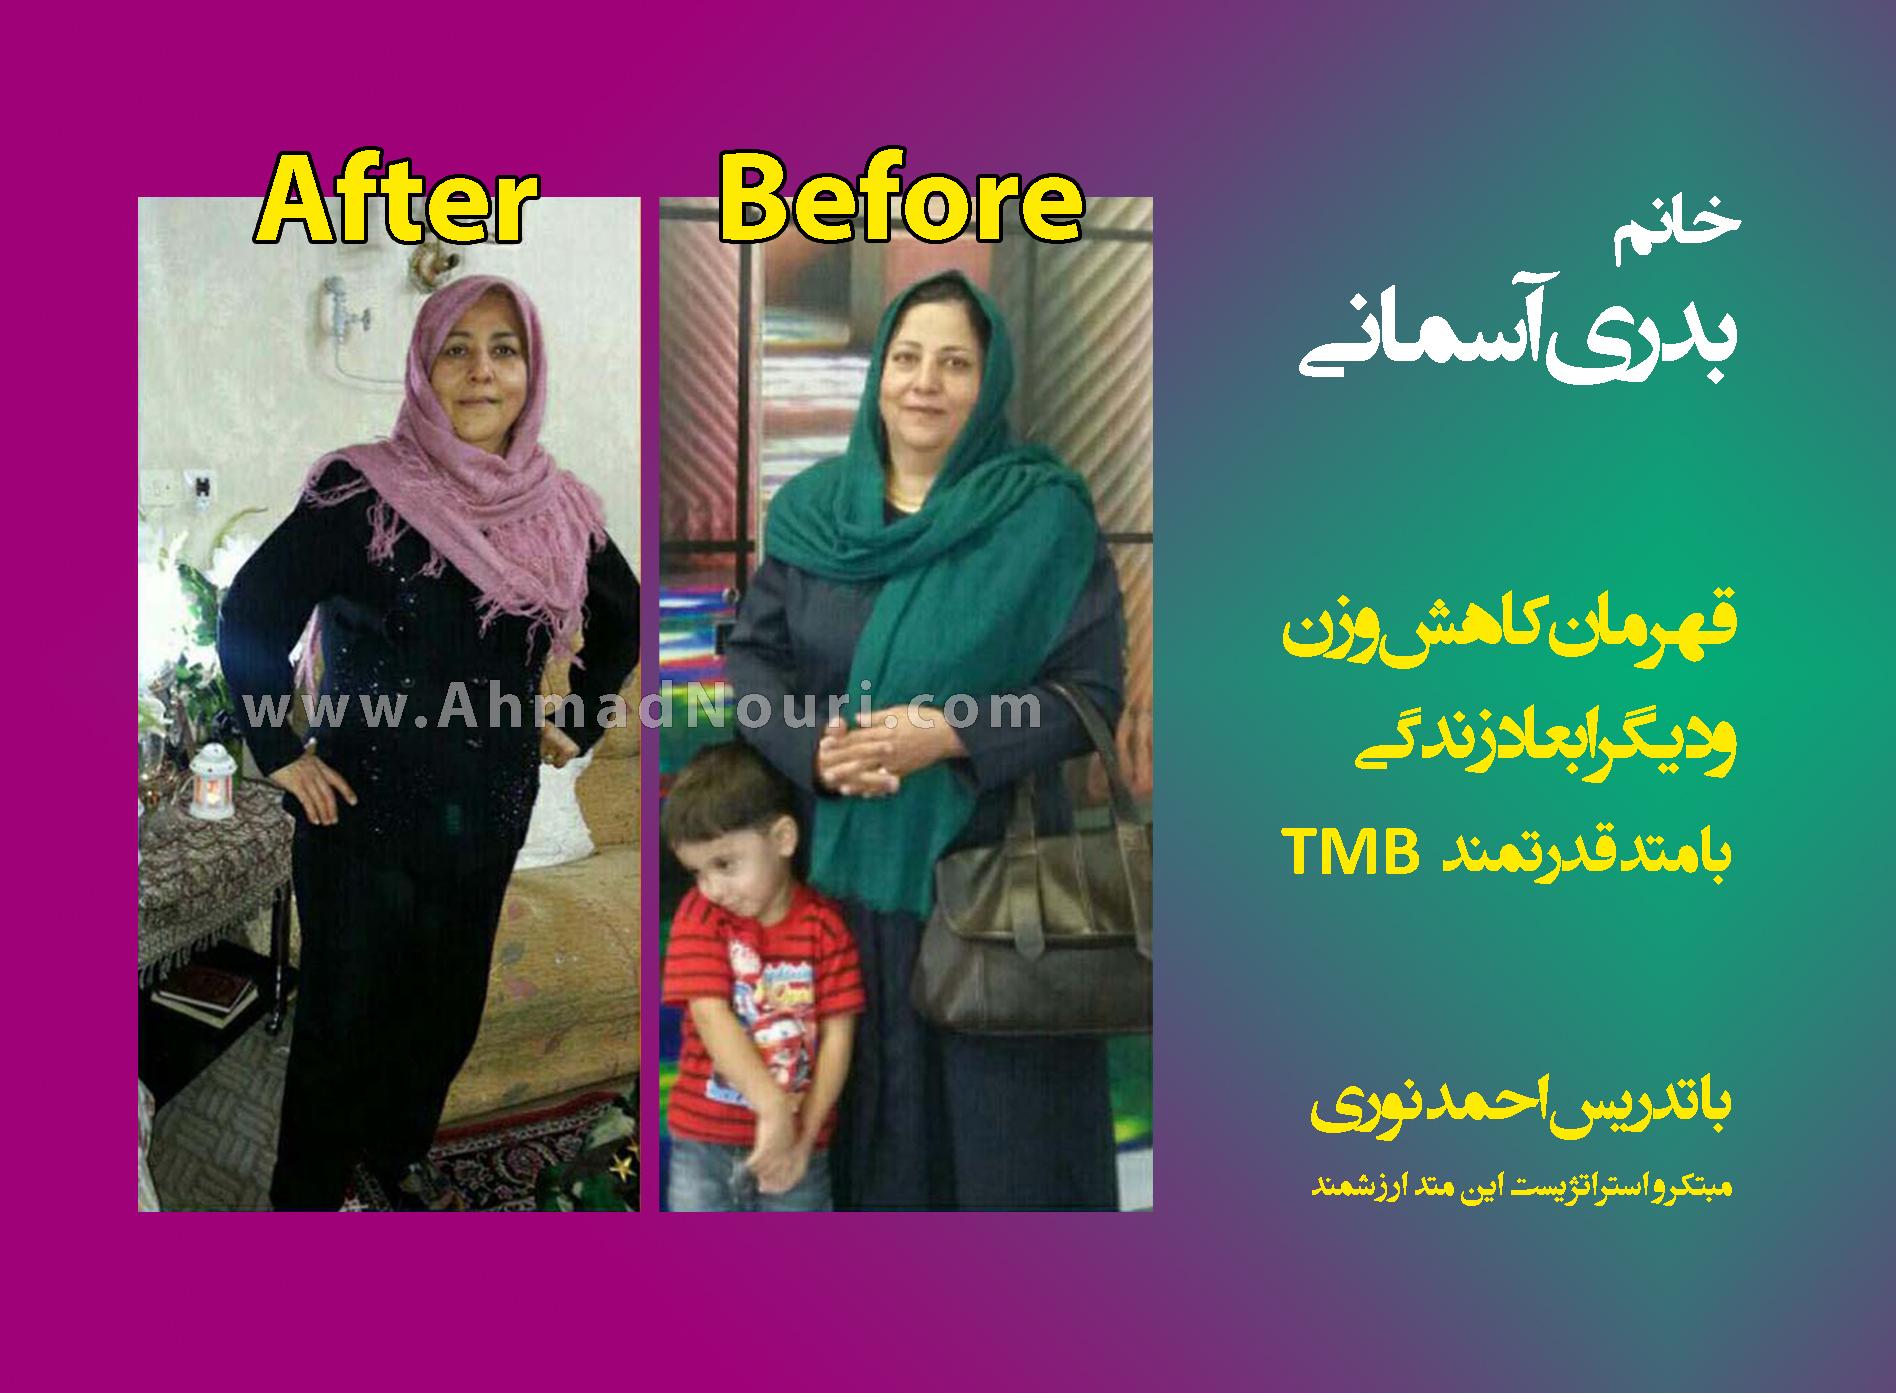 بدری آسمانی - TMB students results